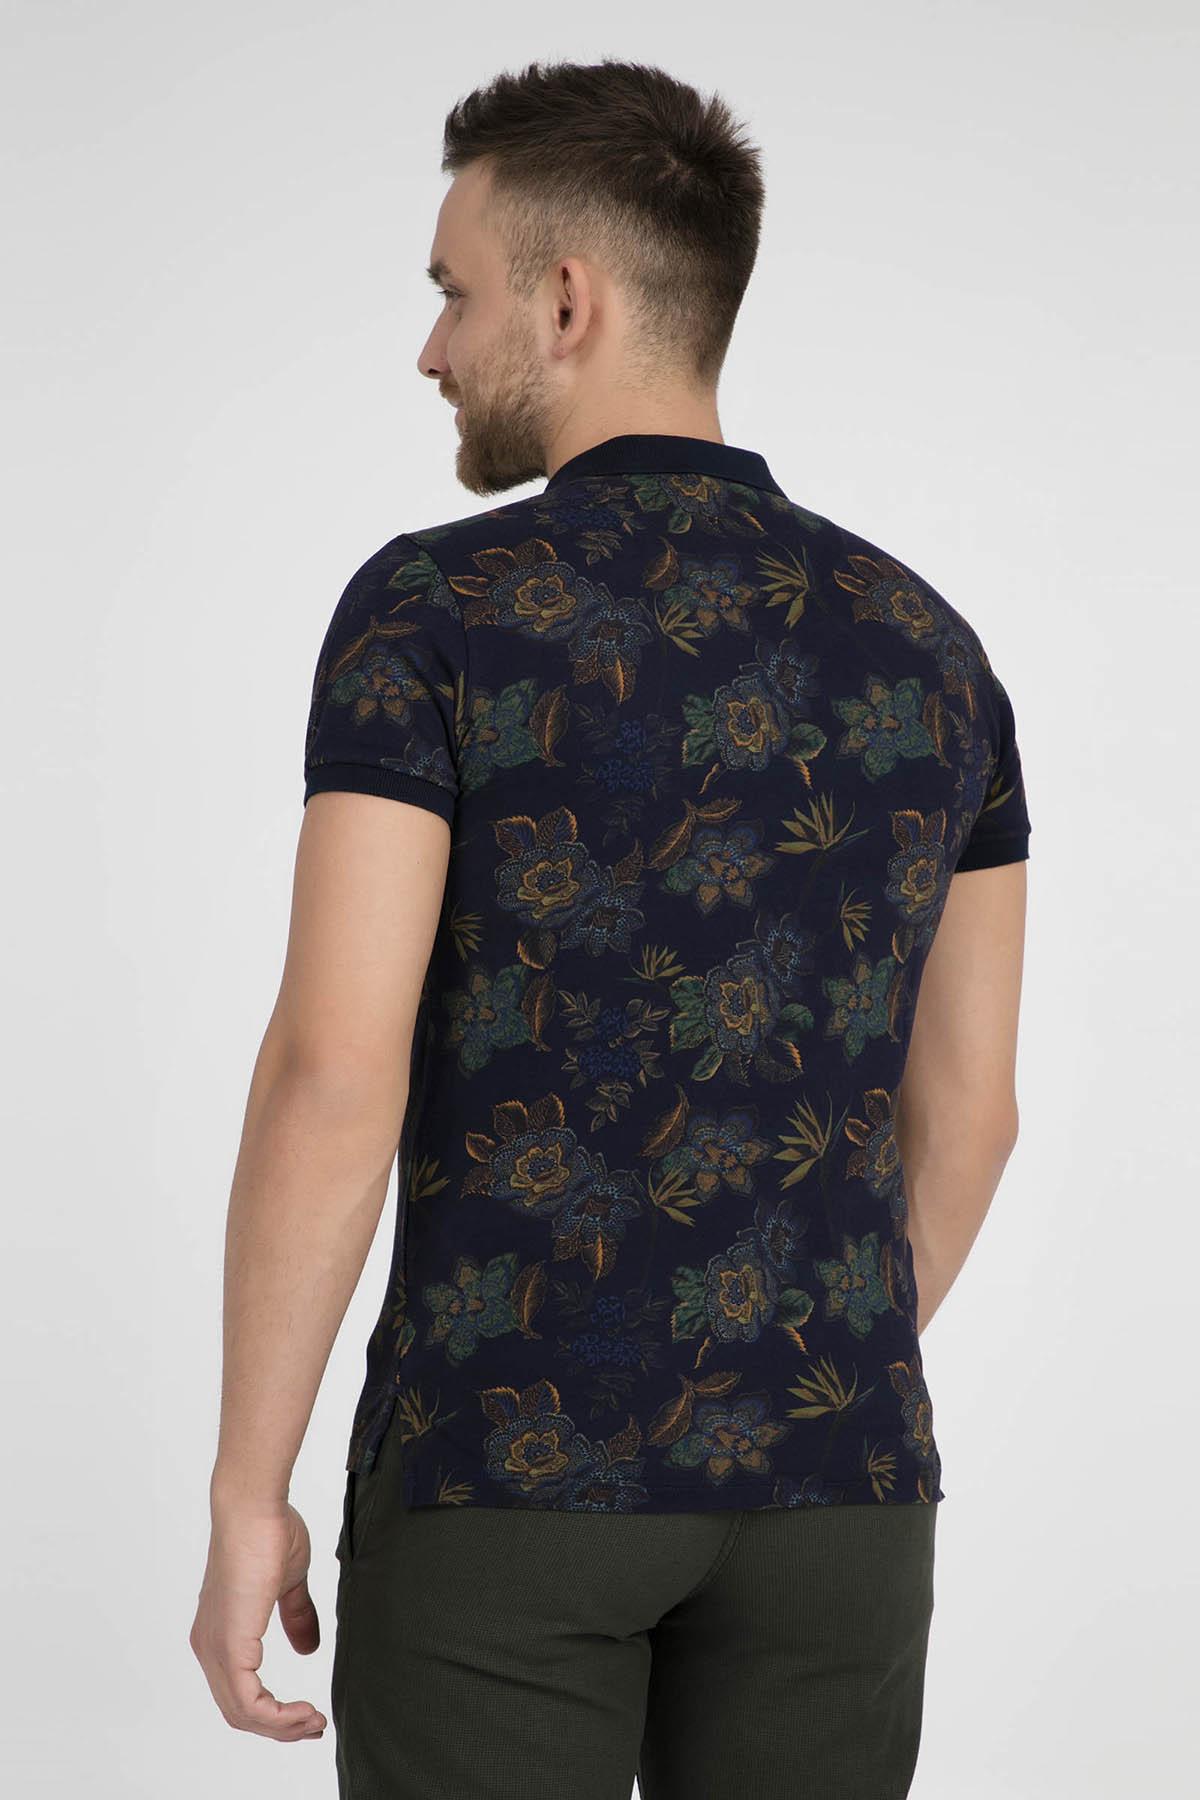 ETRO Erkek Lacivert T-Shirt 1Y040 4070 202 2